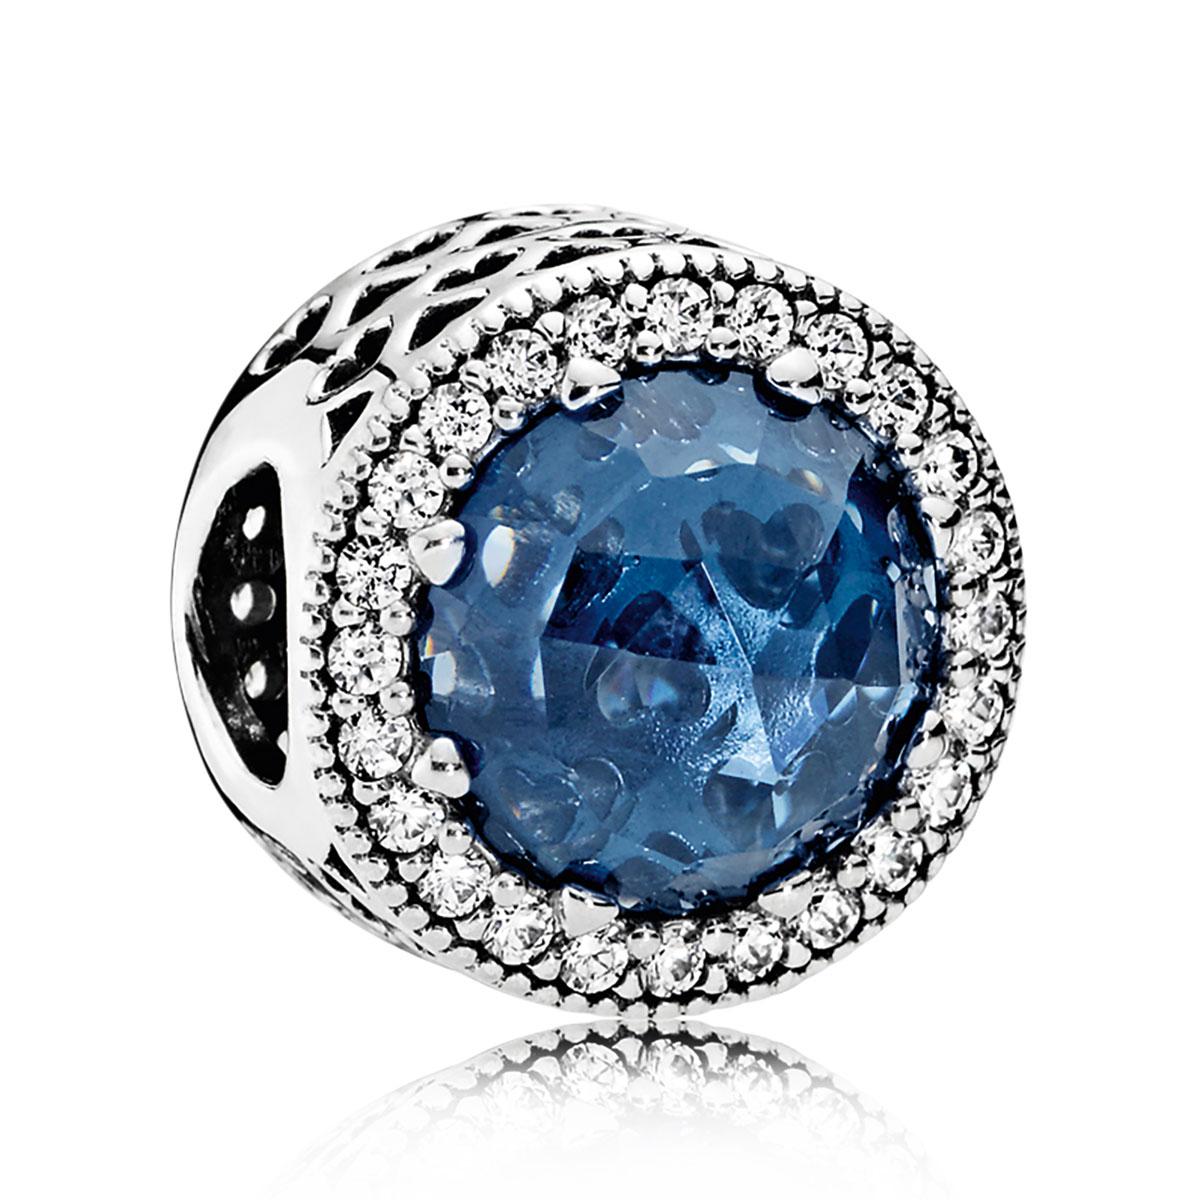 b6a7f078d PANDORA Radiant Hearts, Moonlight Blue Crystal & Clear CZ Charm